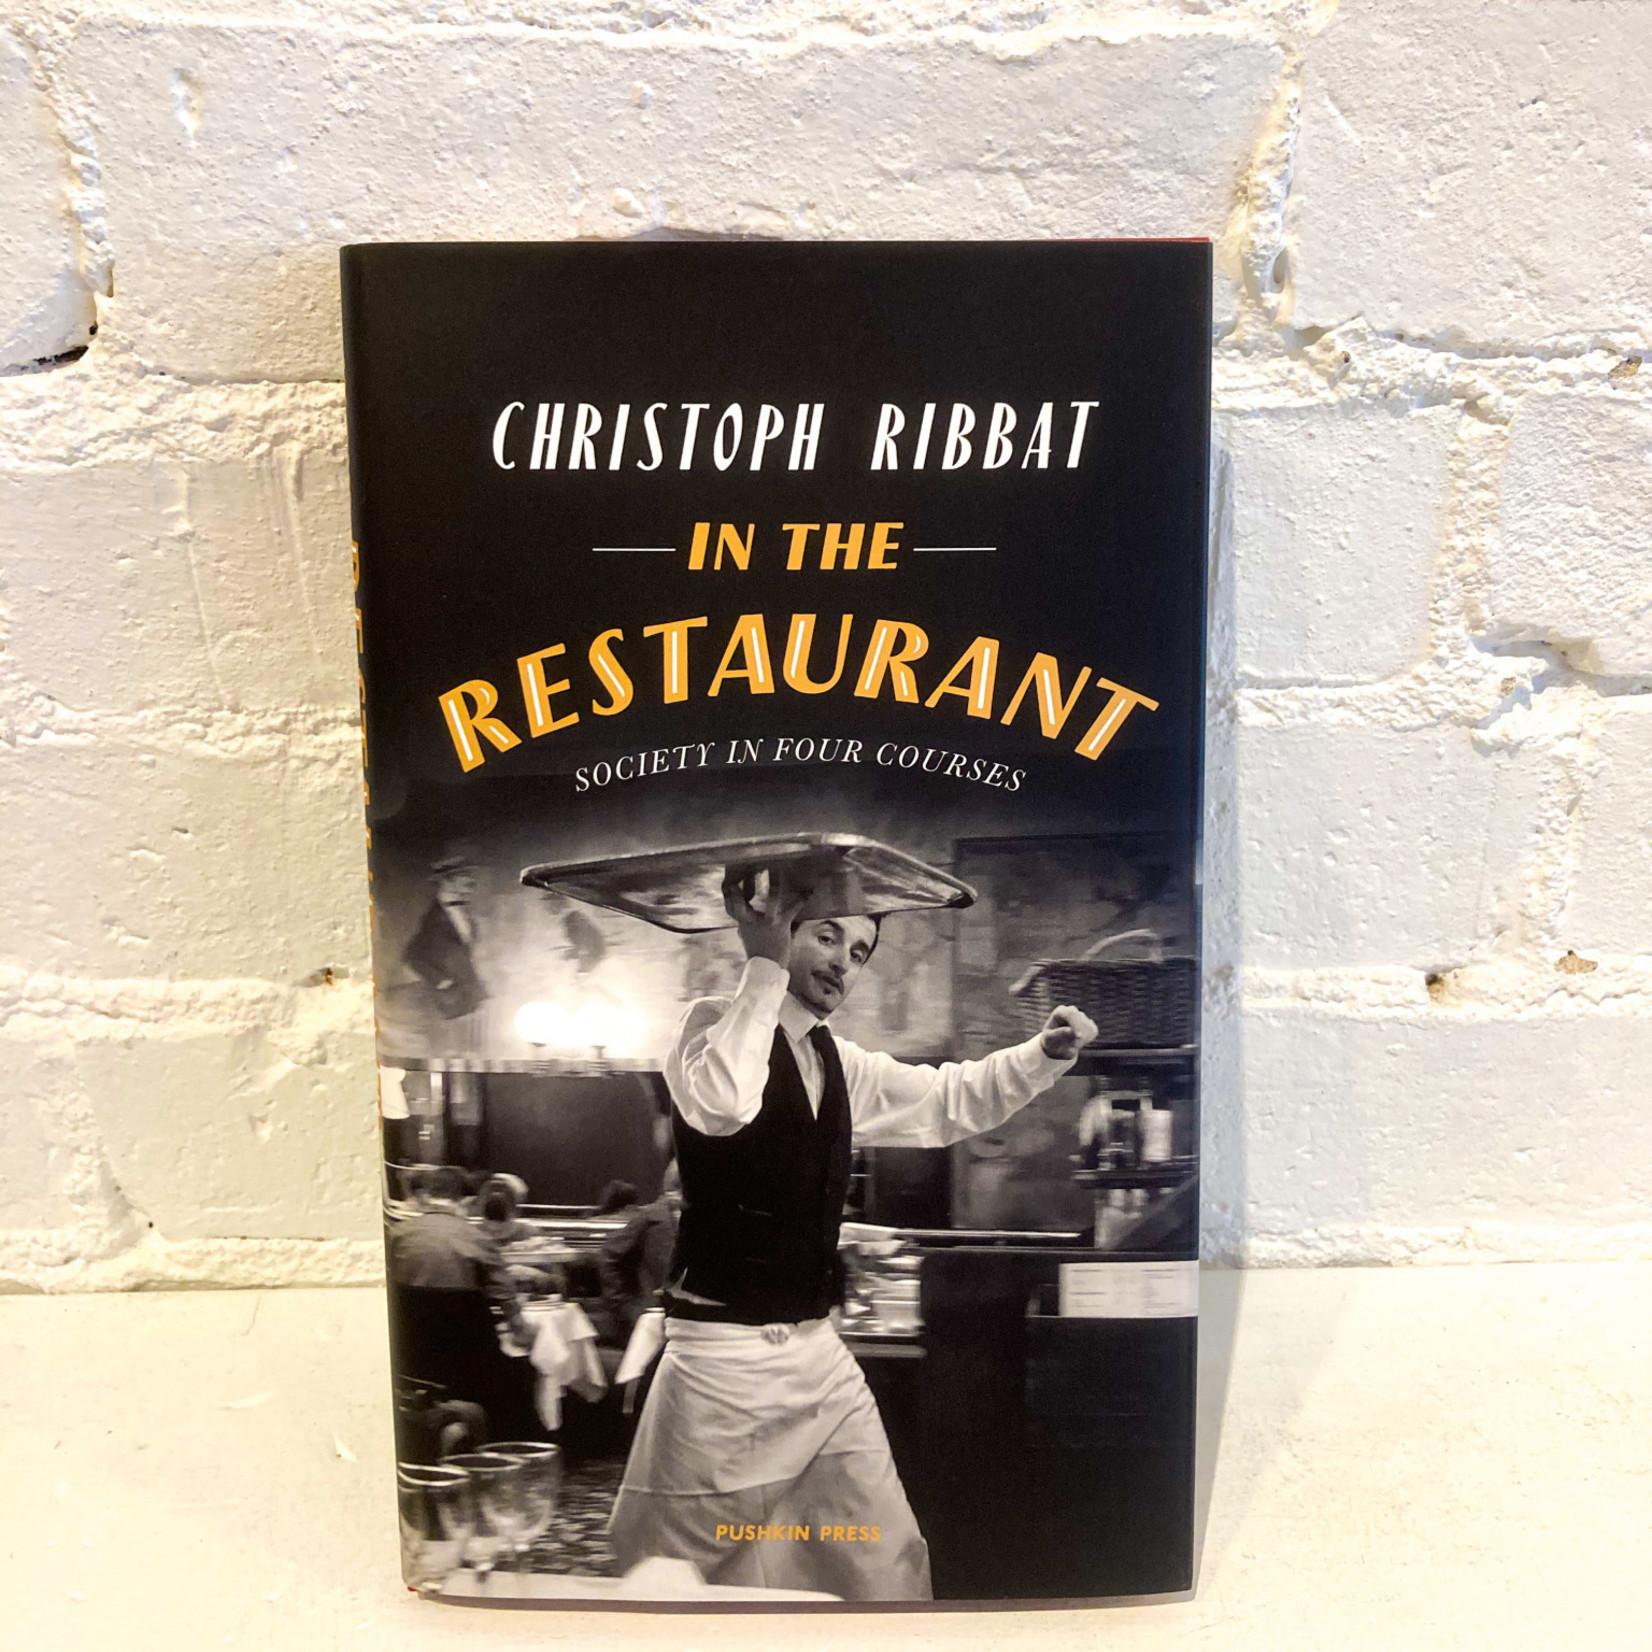 In the Restaurant by Christoph Ribbat